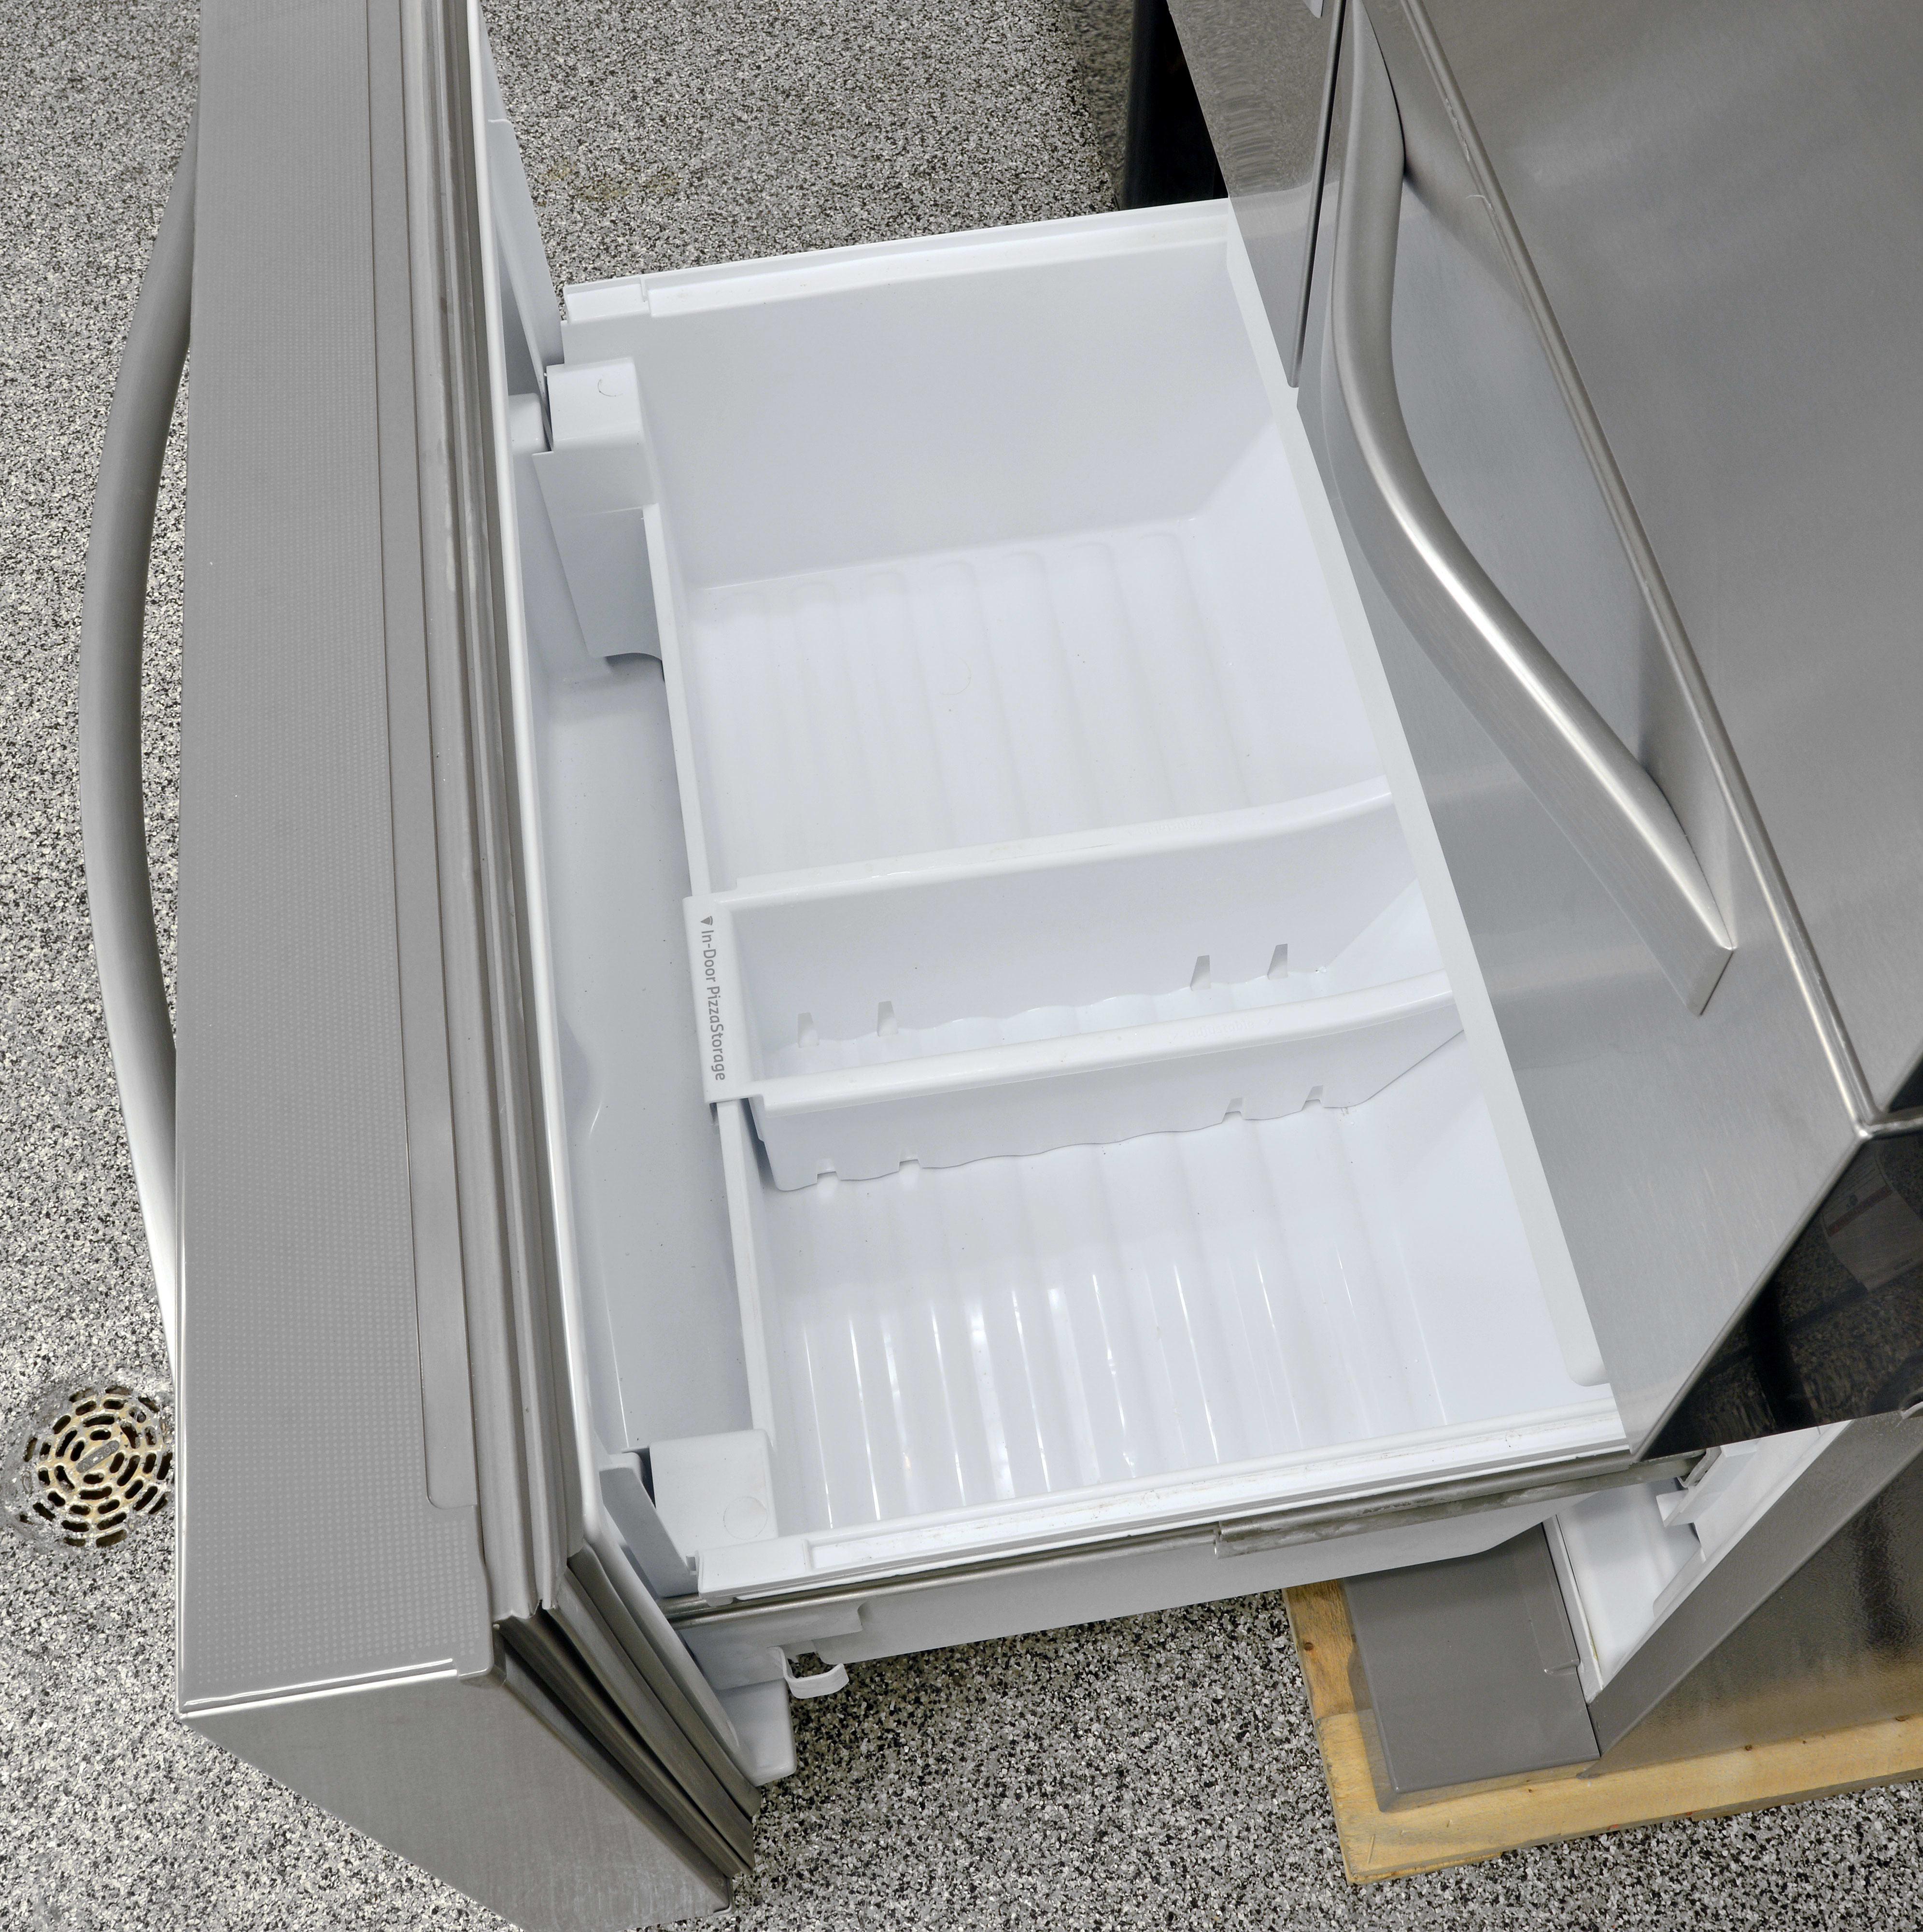 Whirlpool Wrv986fdem French Door Refrigerator Review